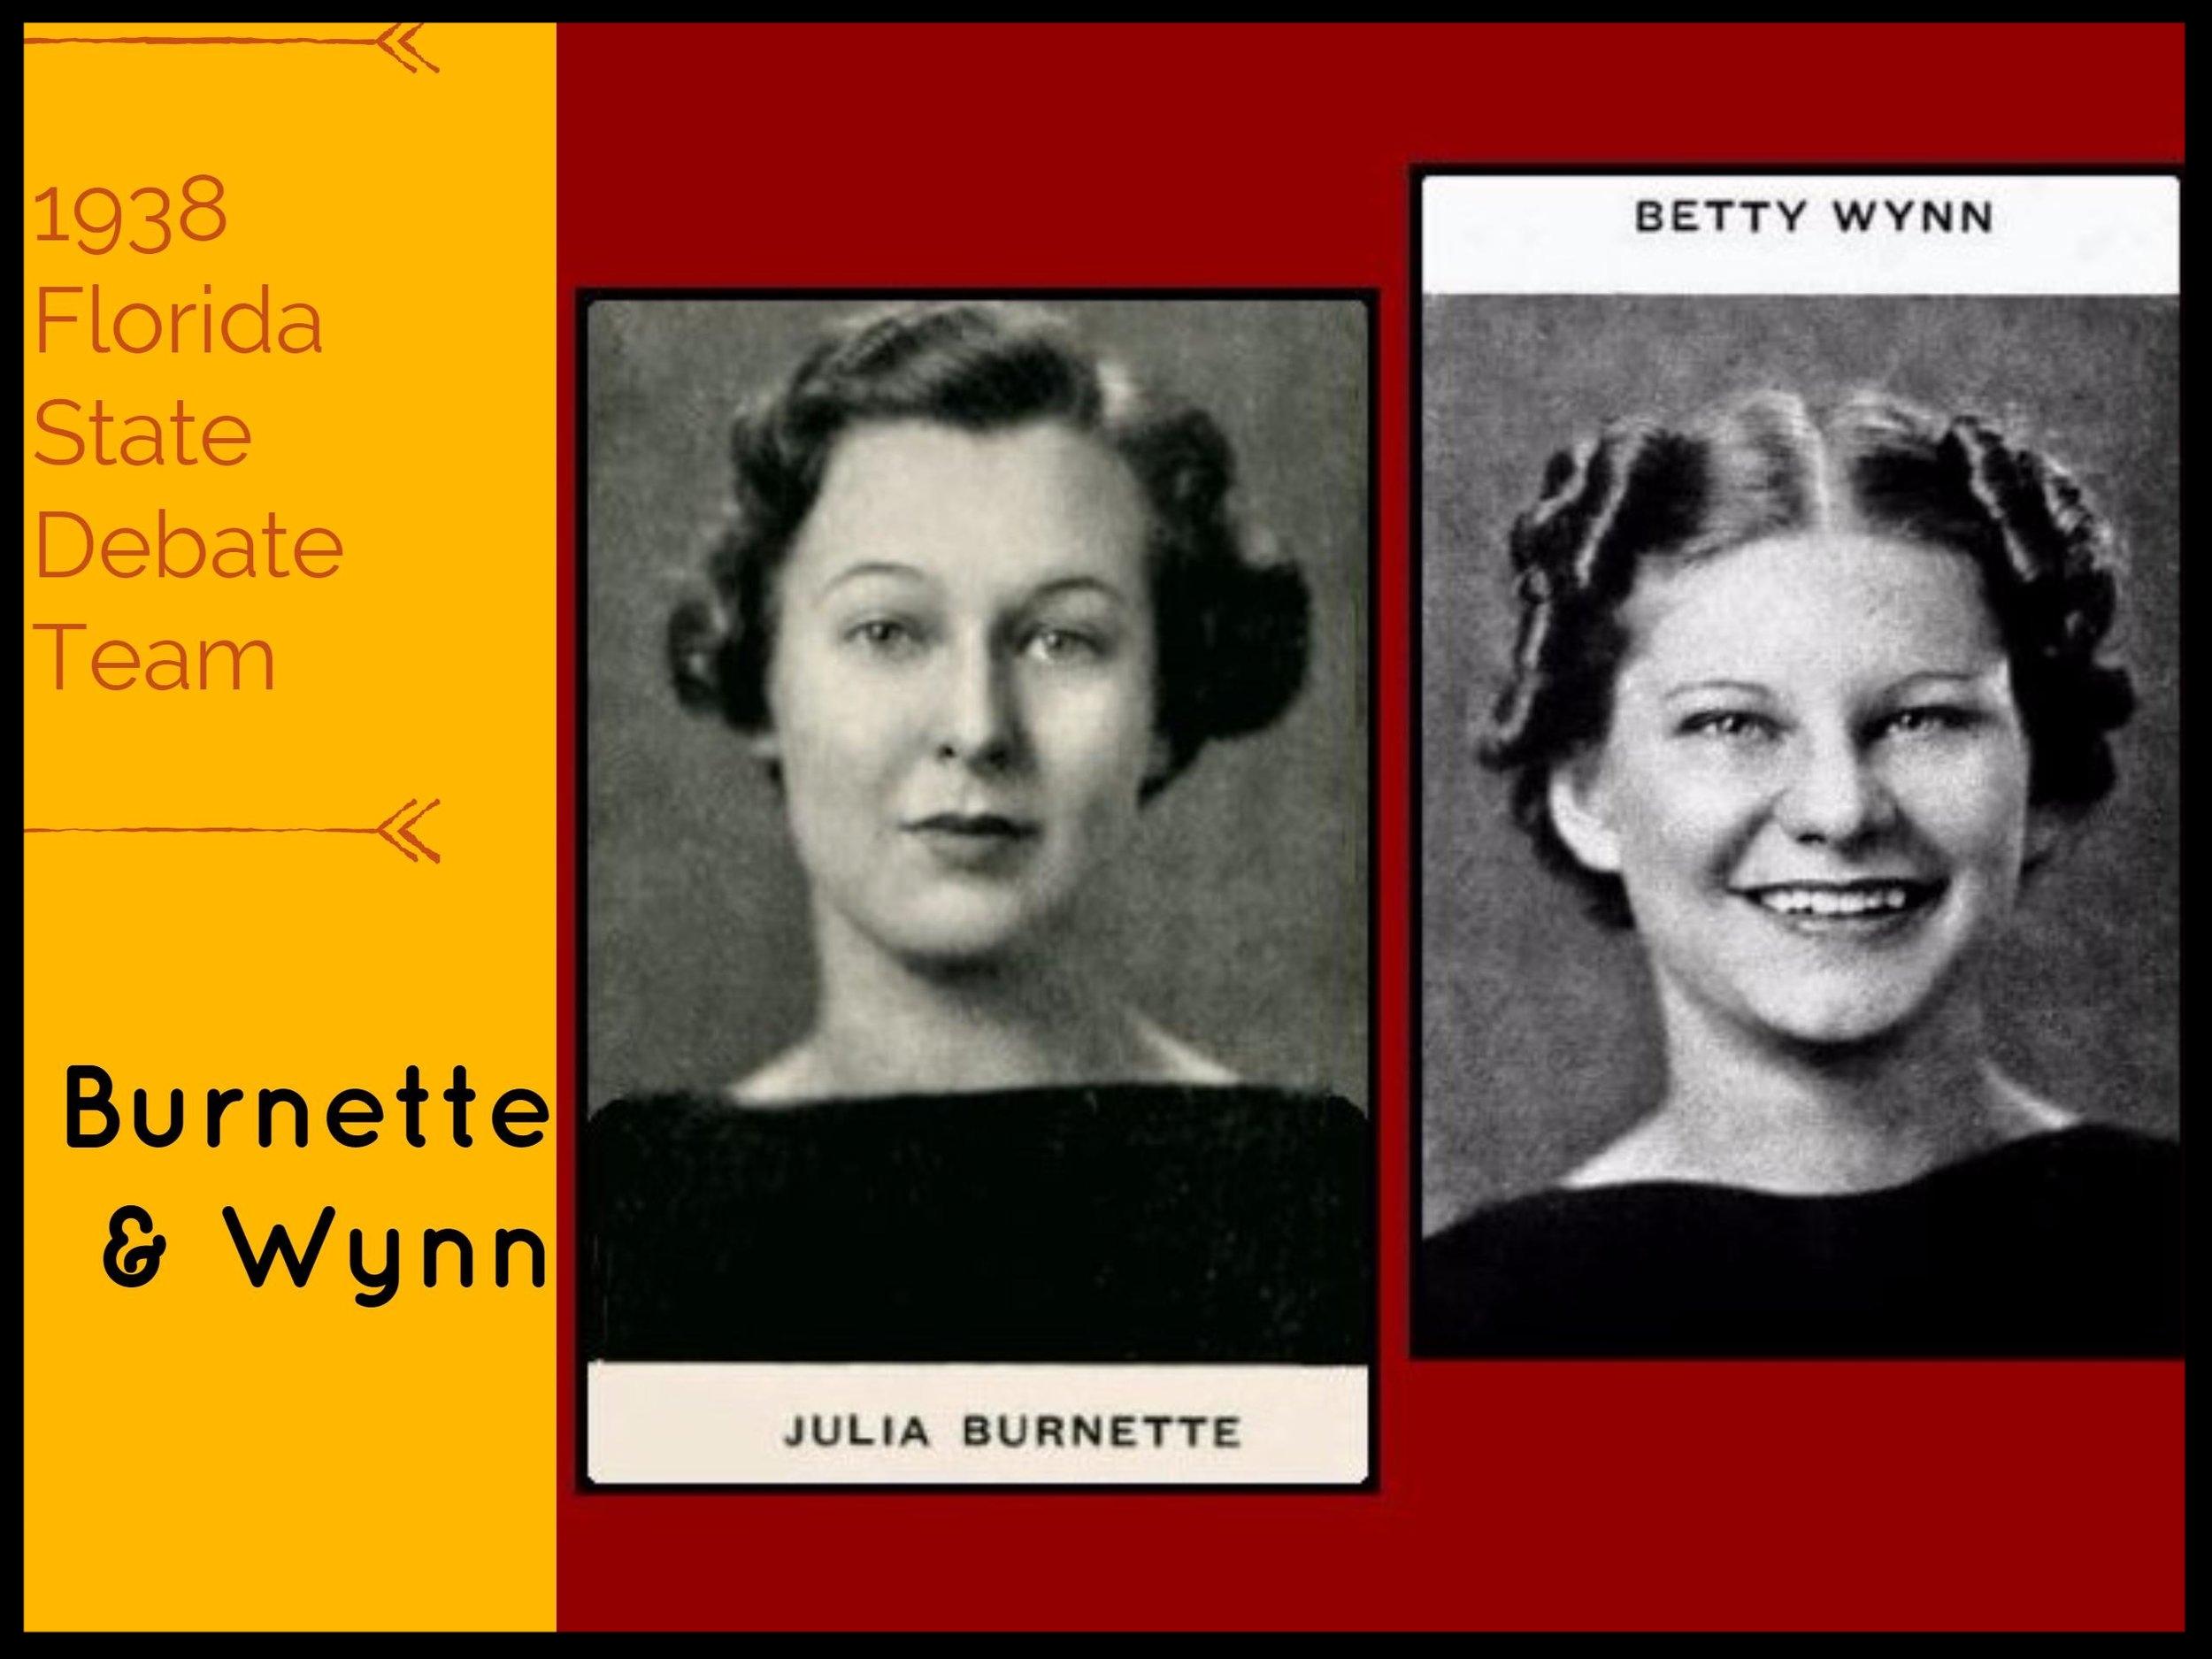 1938 Florida State Debate Team Burnette & Wynn